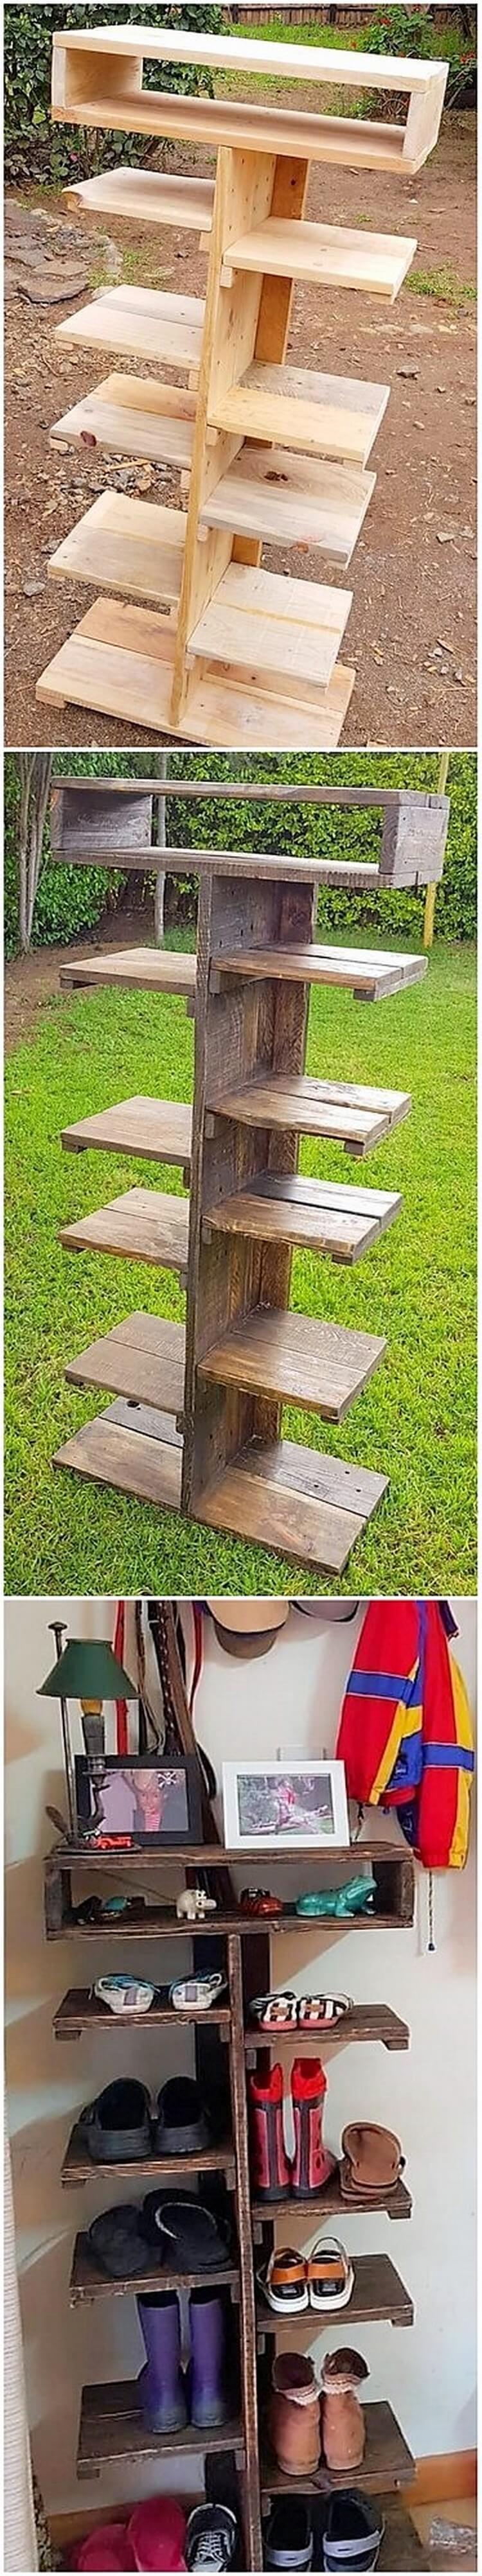 Wood Pallet Shoe Rack